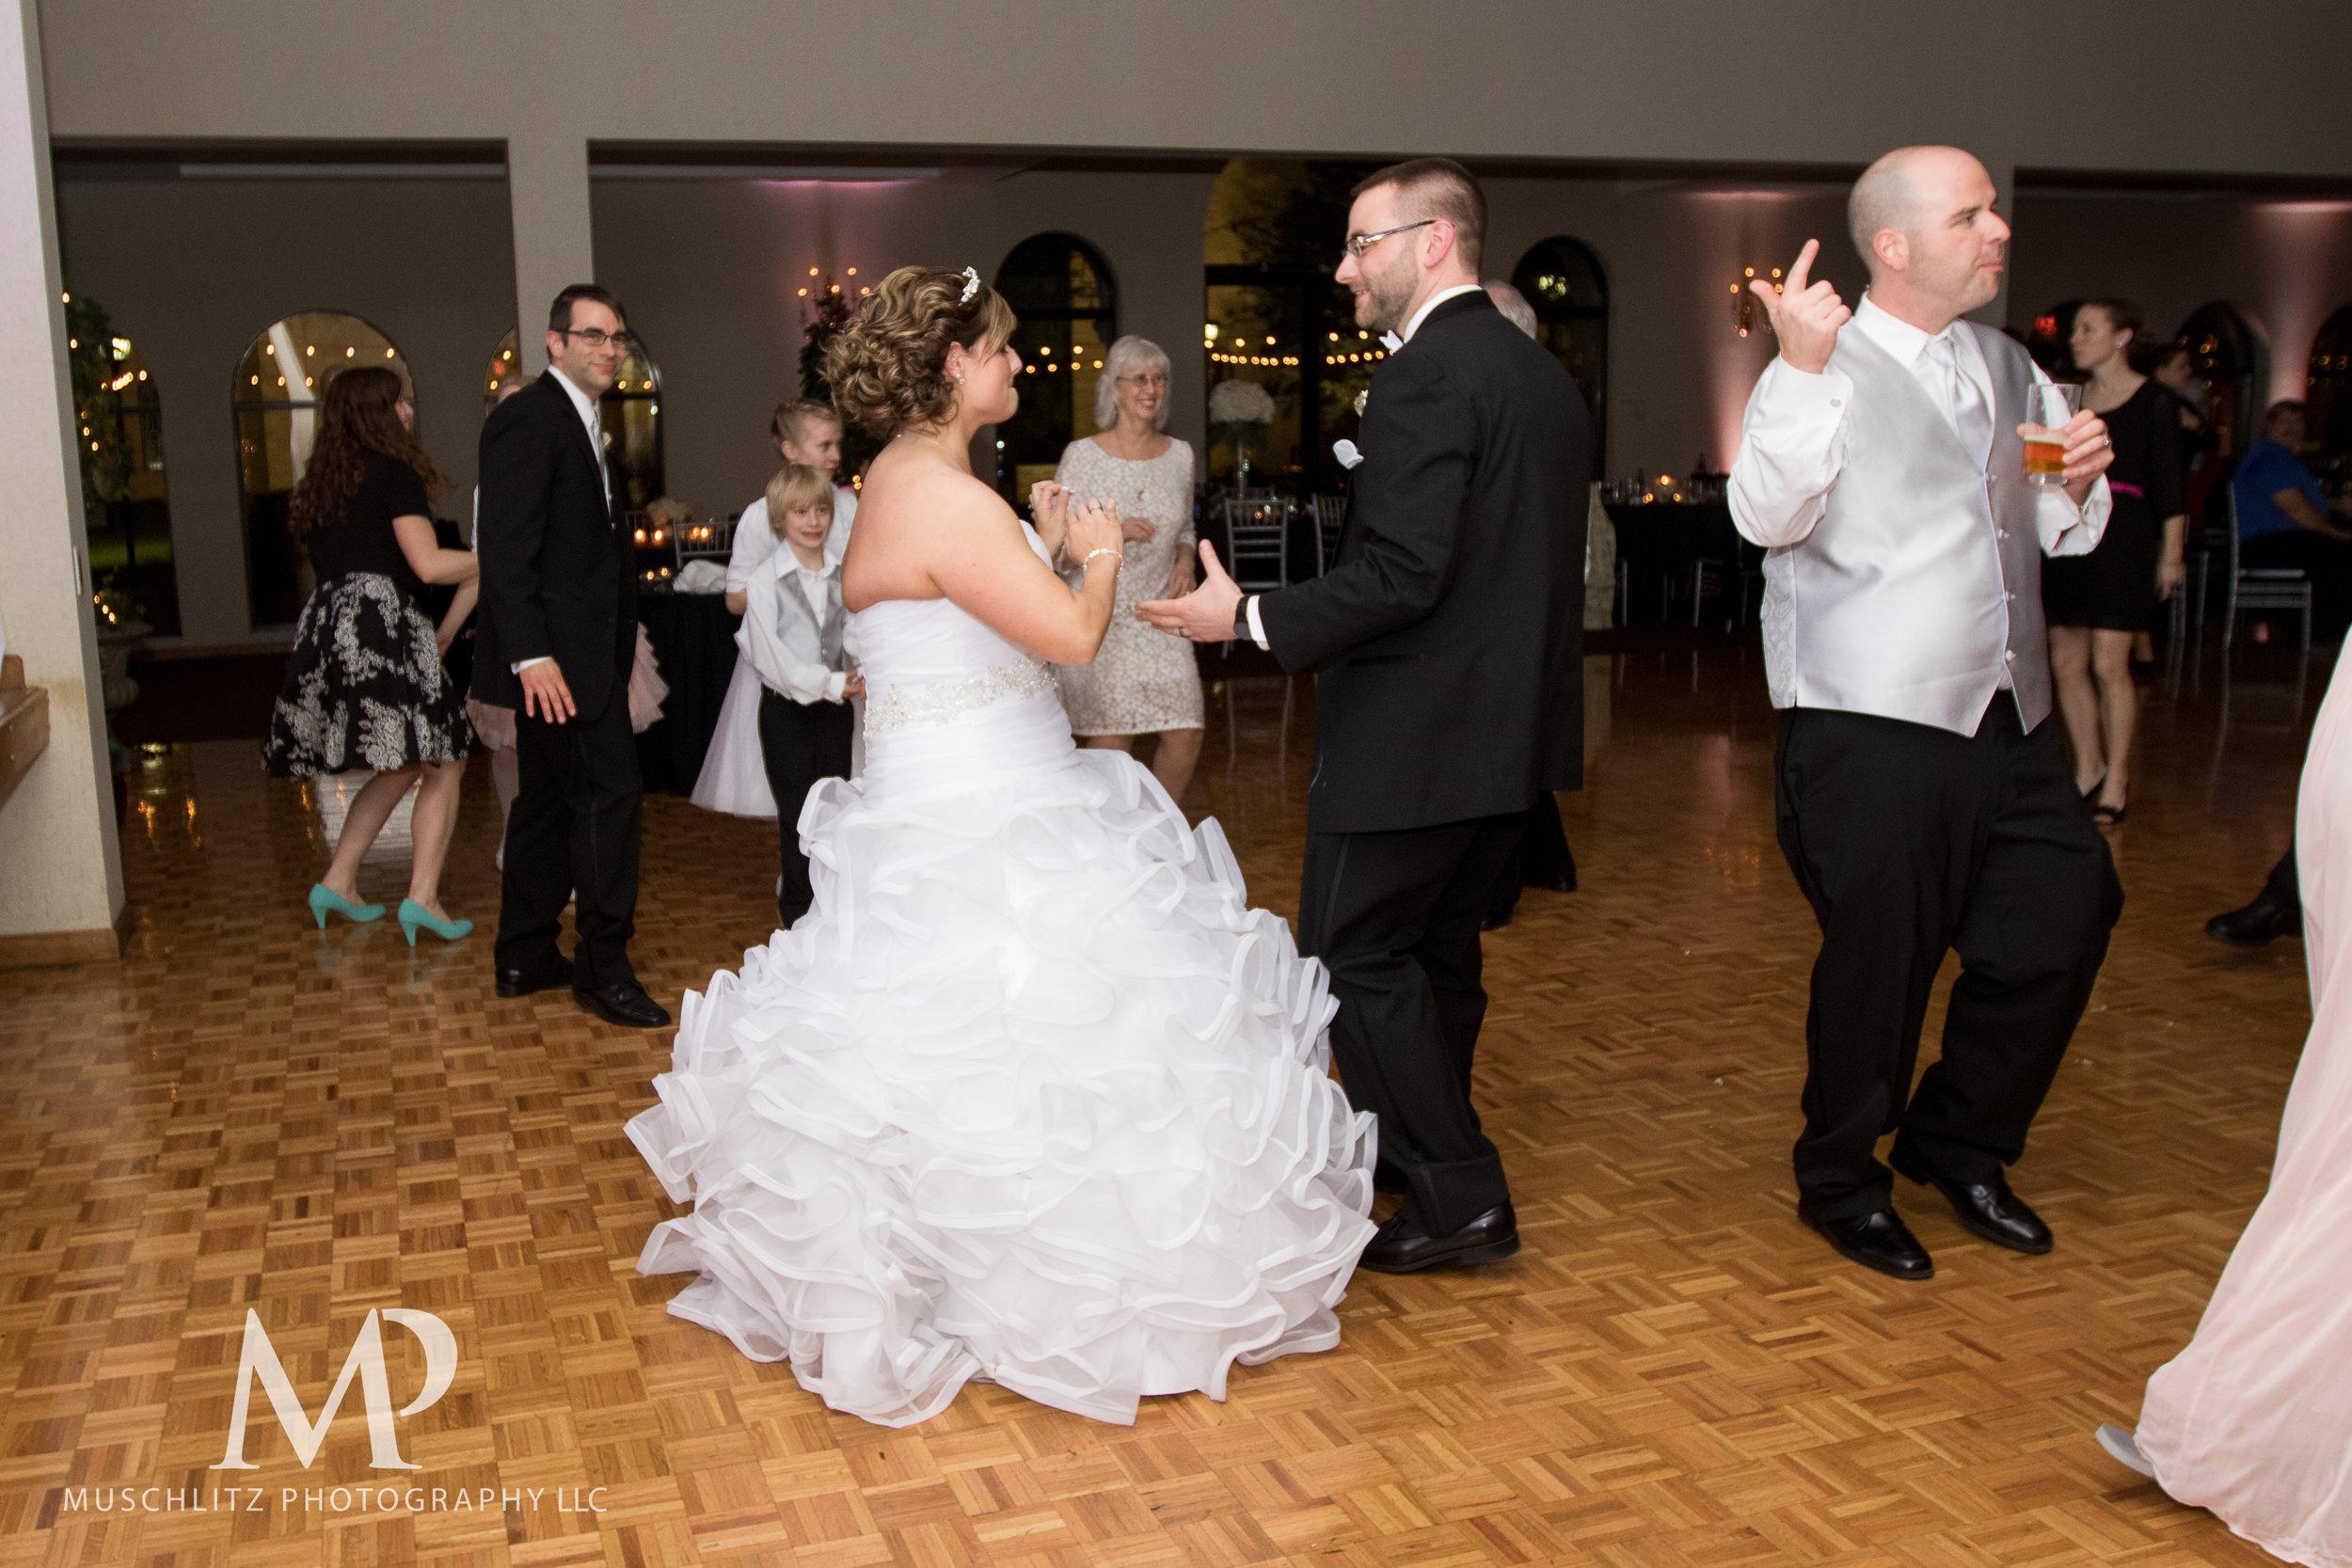 annunciation-banquet-conference-center-downtown-columbus-wedding-reception-downtown-columbus-ohio-muschlitz-photography-028.JPG